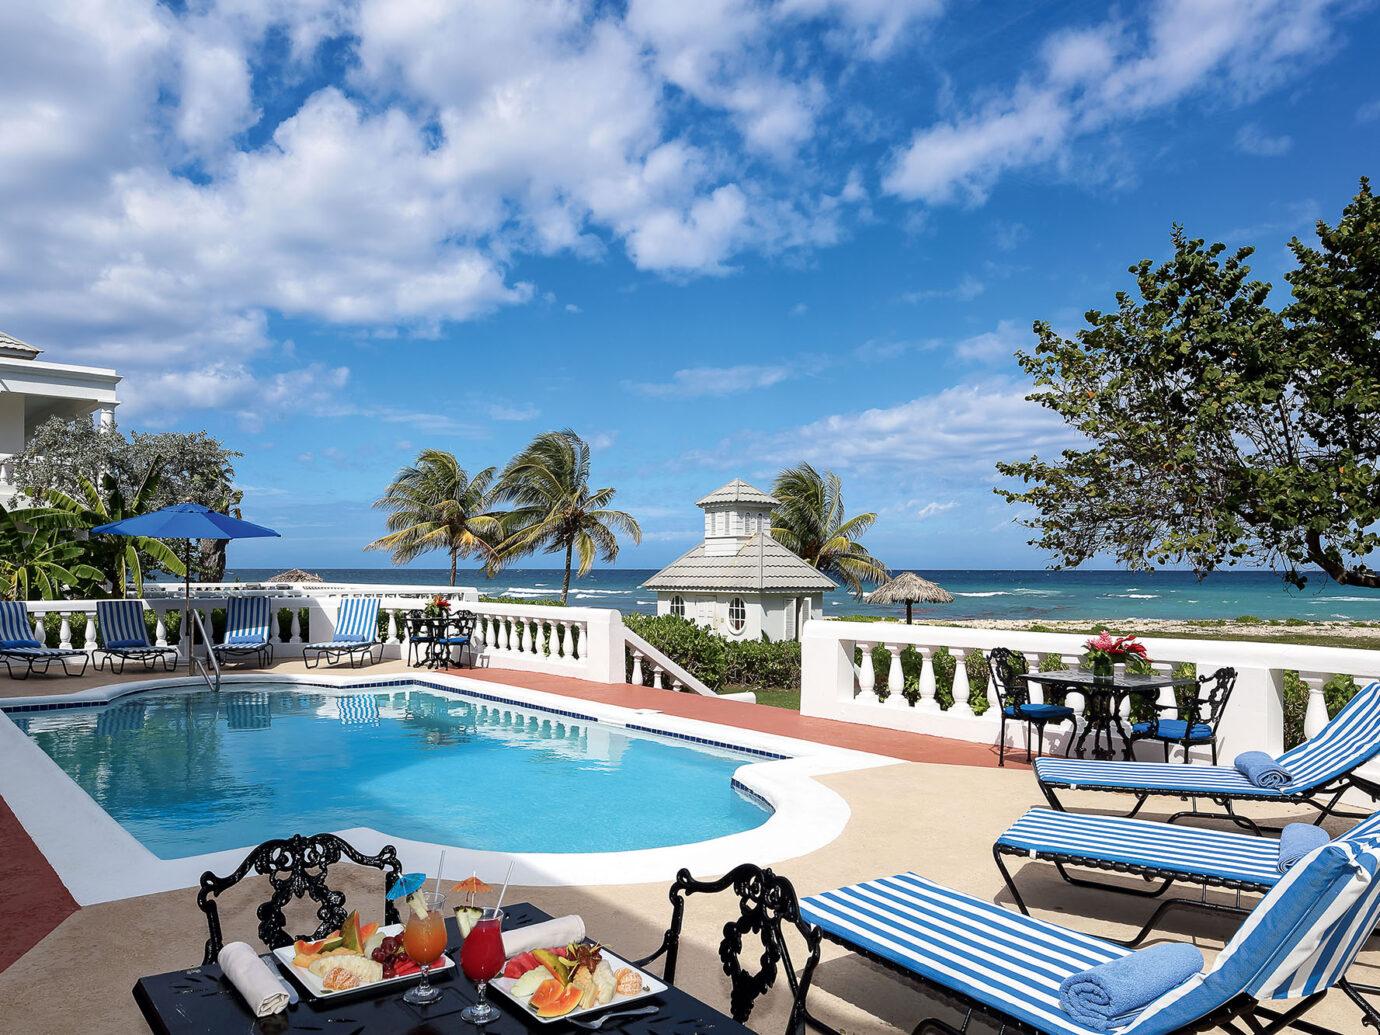 Pool of a villa at Half Moon, Montego Bay, Jamaica